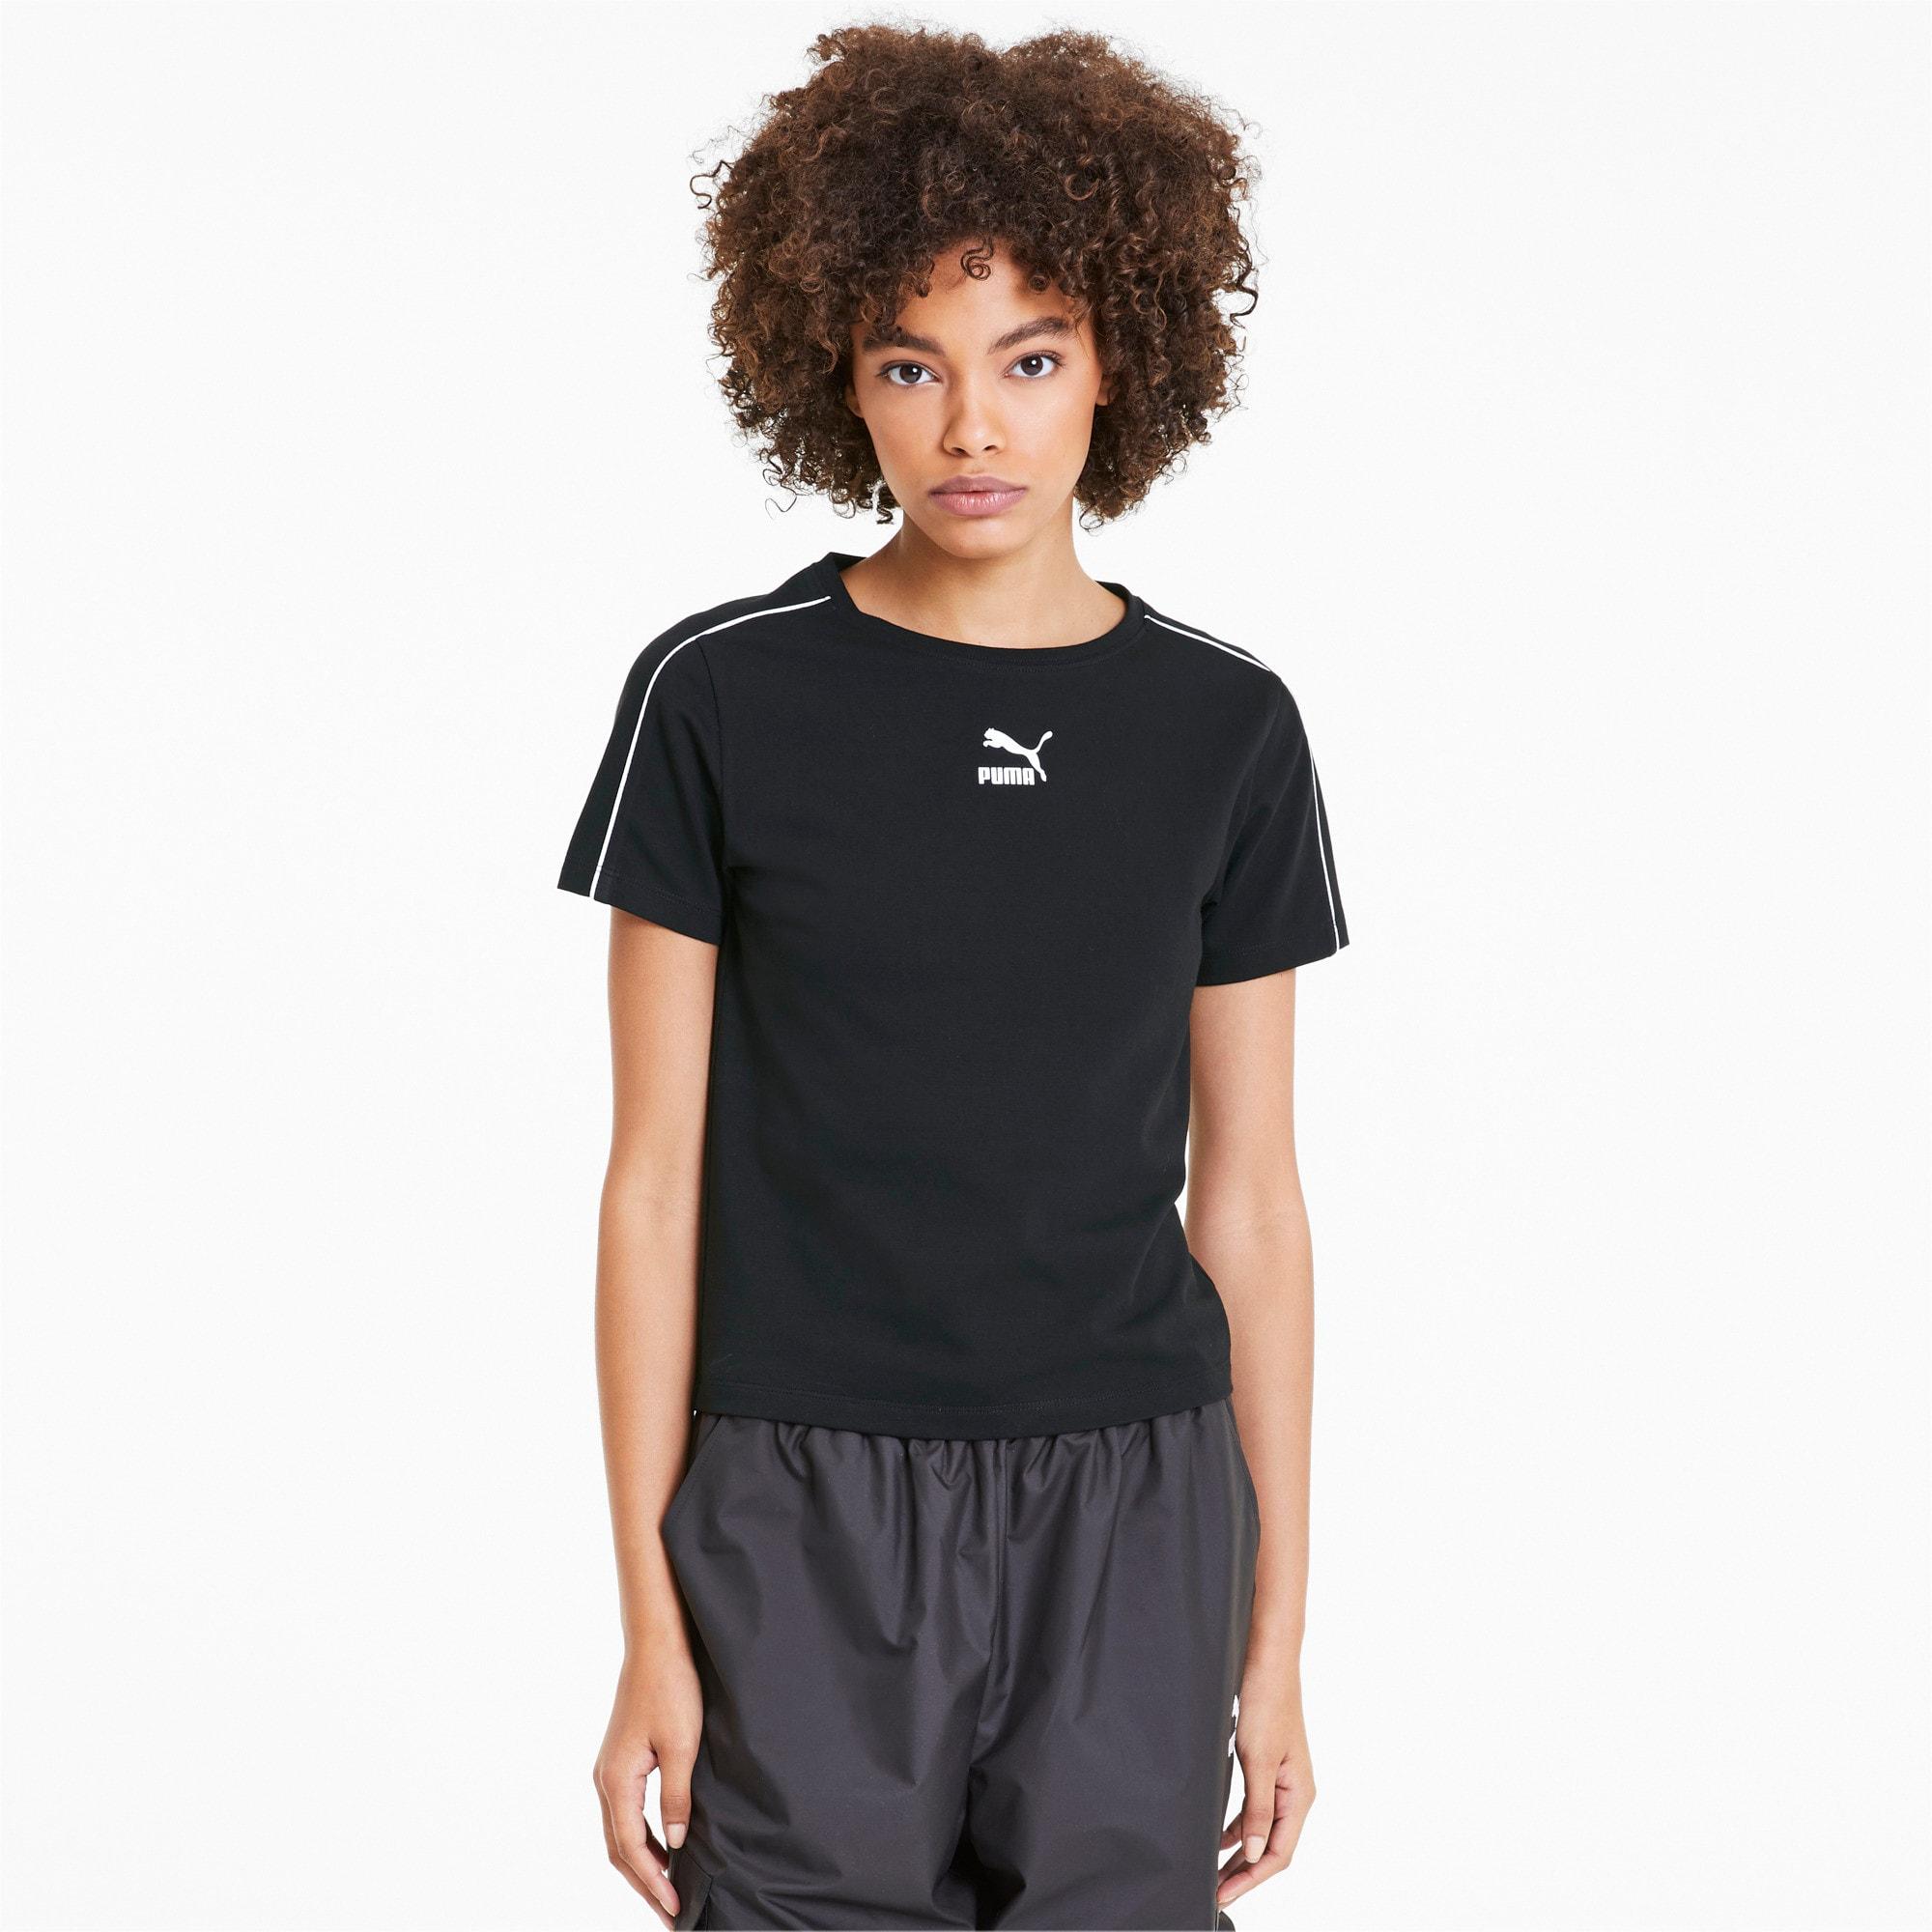 Miniatura 1 de Camiseta Classics Tight para mujer, Puma Black, mediano